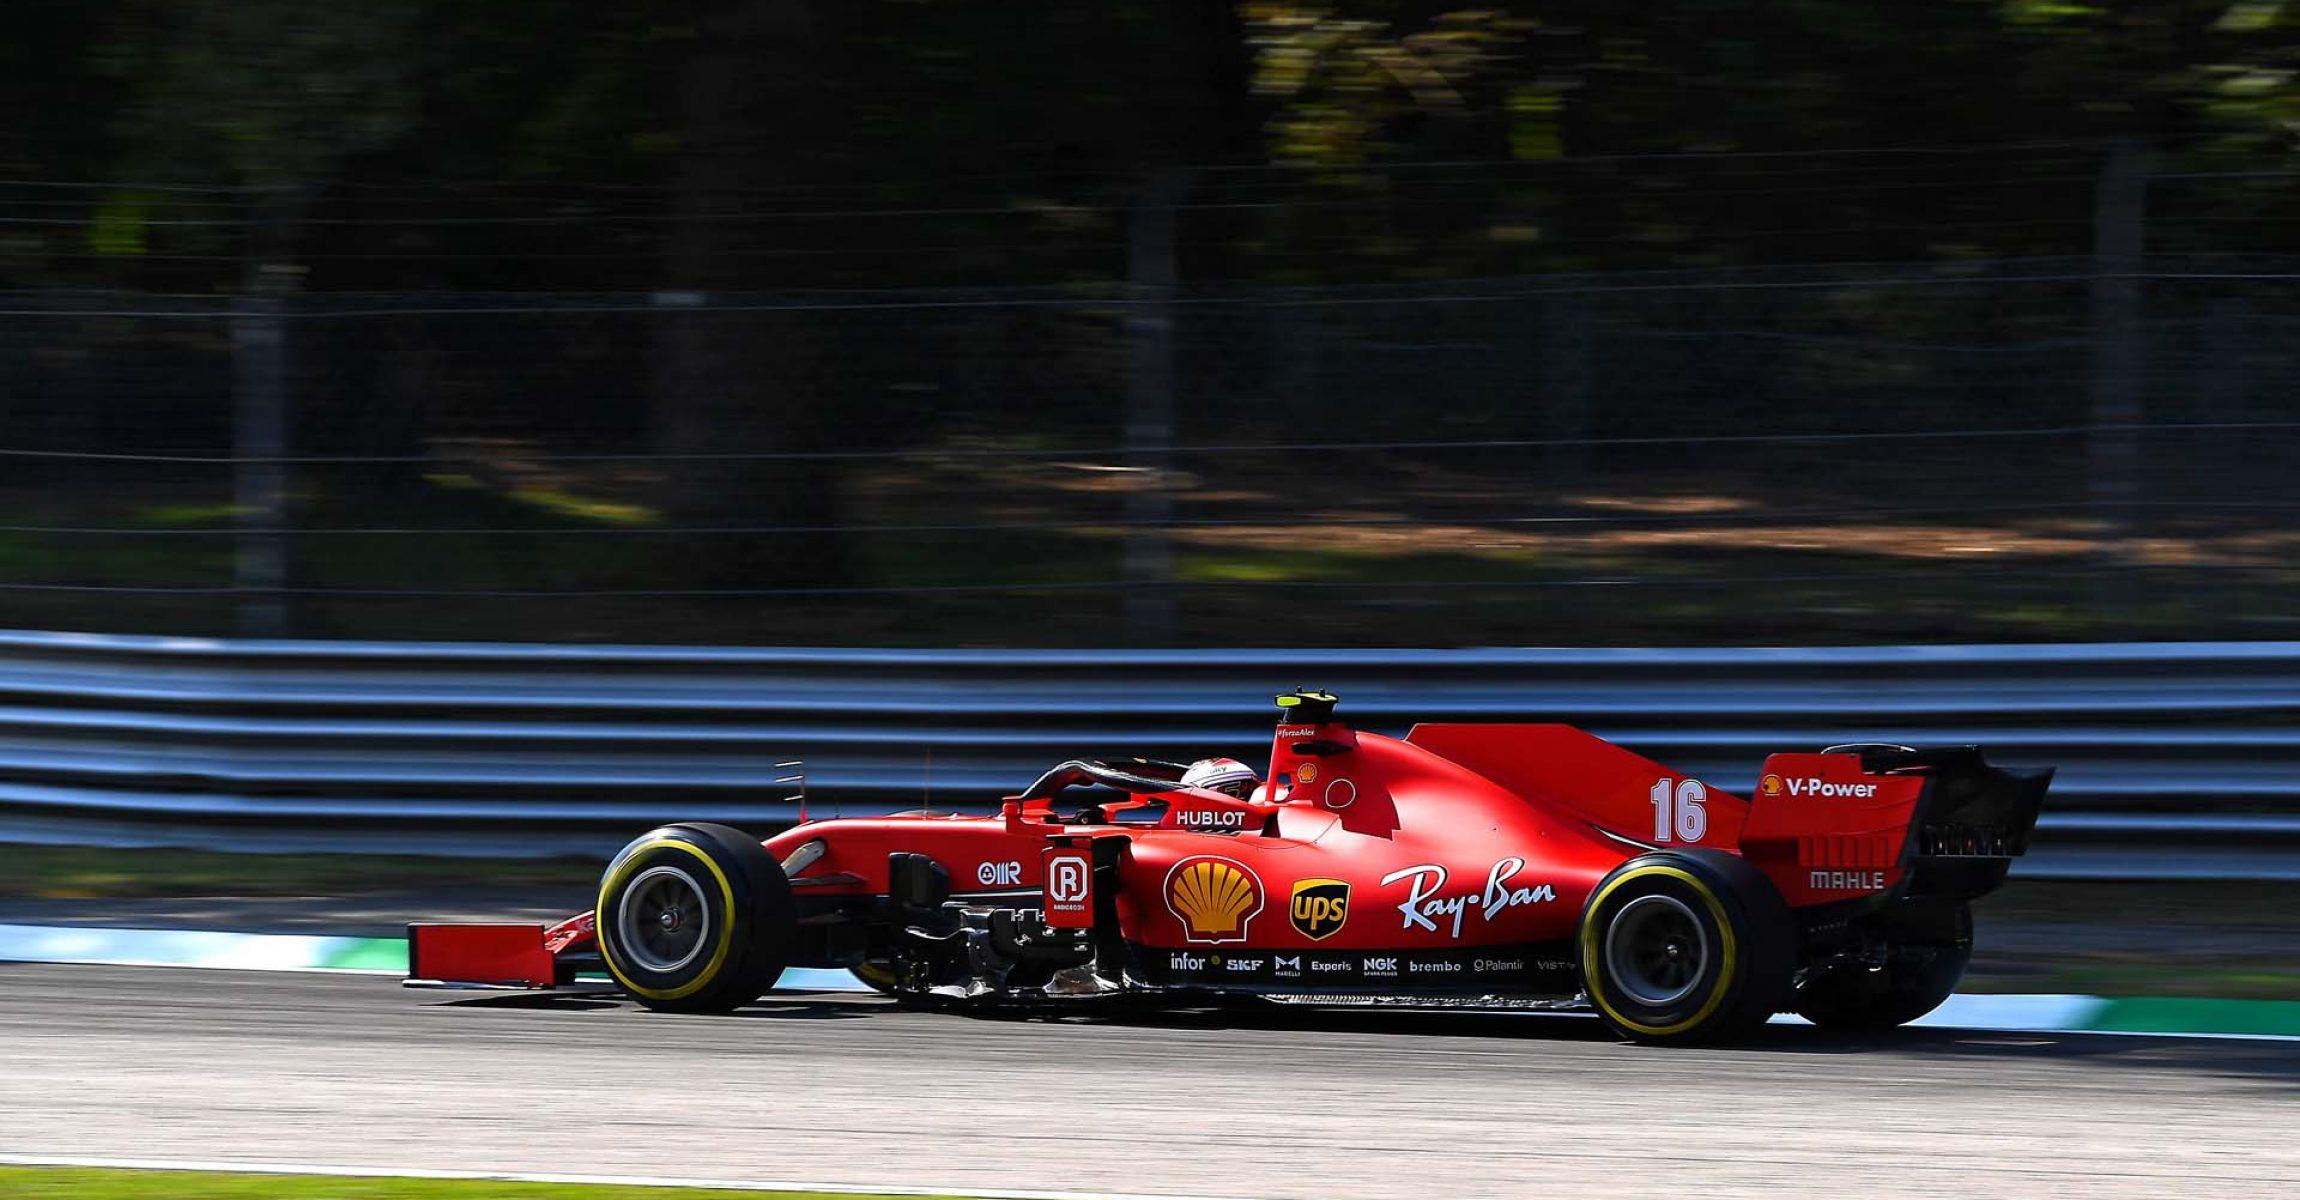 GP ITALIA F1/2020 -  VENERDÌ 04/09/2020       credit: @Scuderia Ferrari Press Office Charles Leclerc